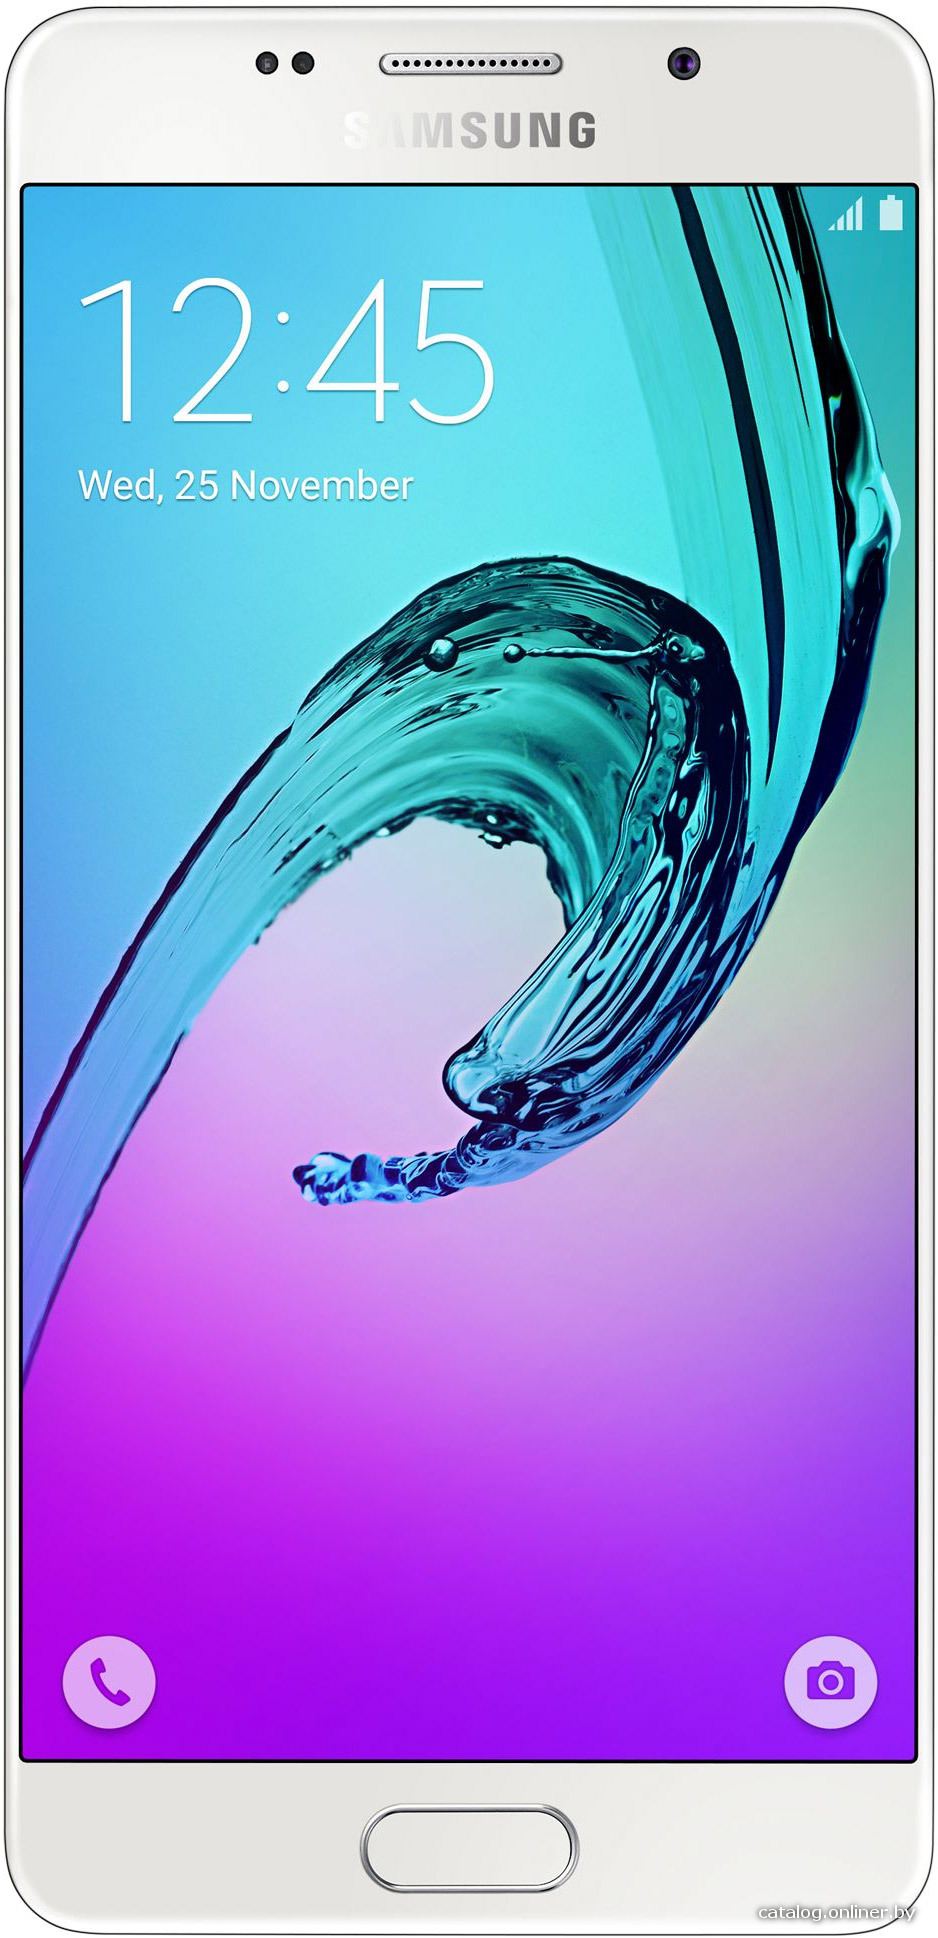 "Смартфон Samsung Galaxy A5 (2016) SM-A510F-DS White (1.6GHz,2GbRAM,5.2""1920x1080,4G+BT+WiFi+GPS,16Gb+microSD,13Mp,Andr)"